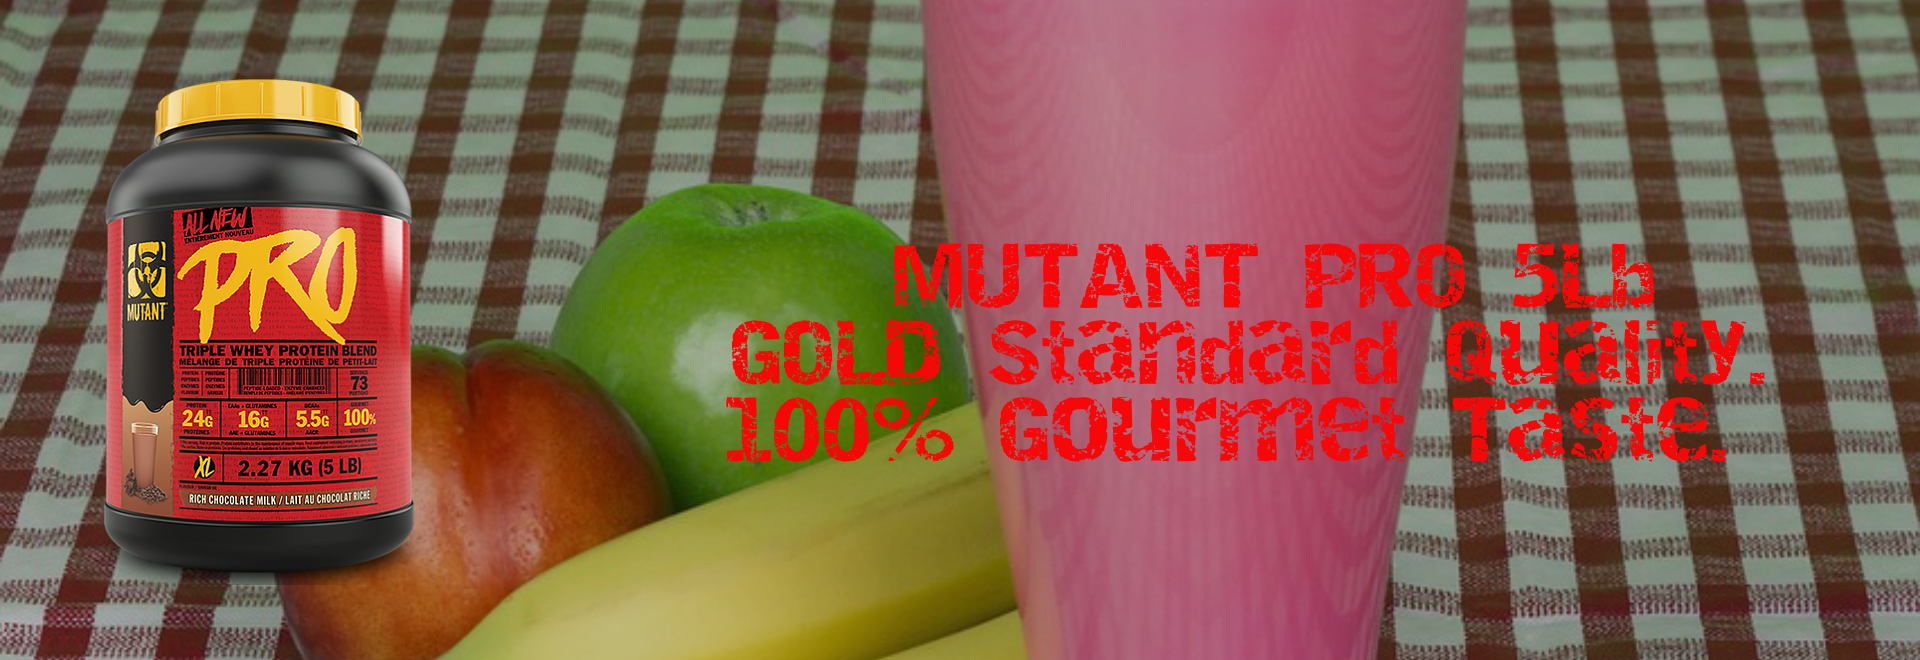 Mutant PRO